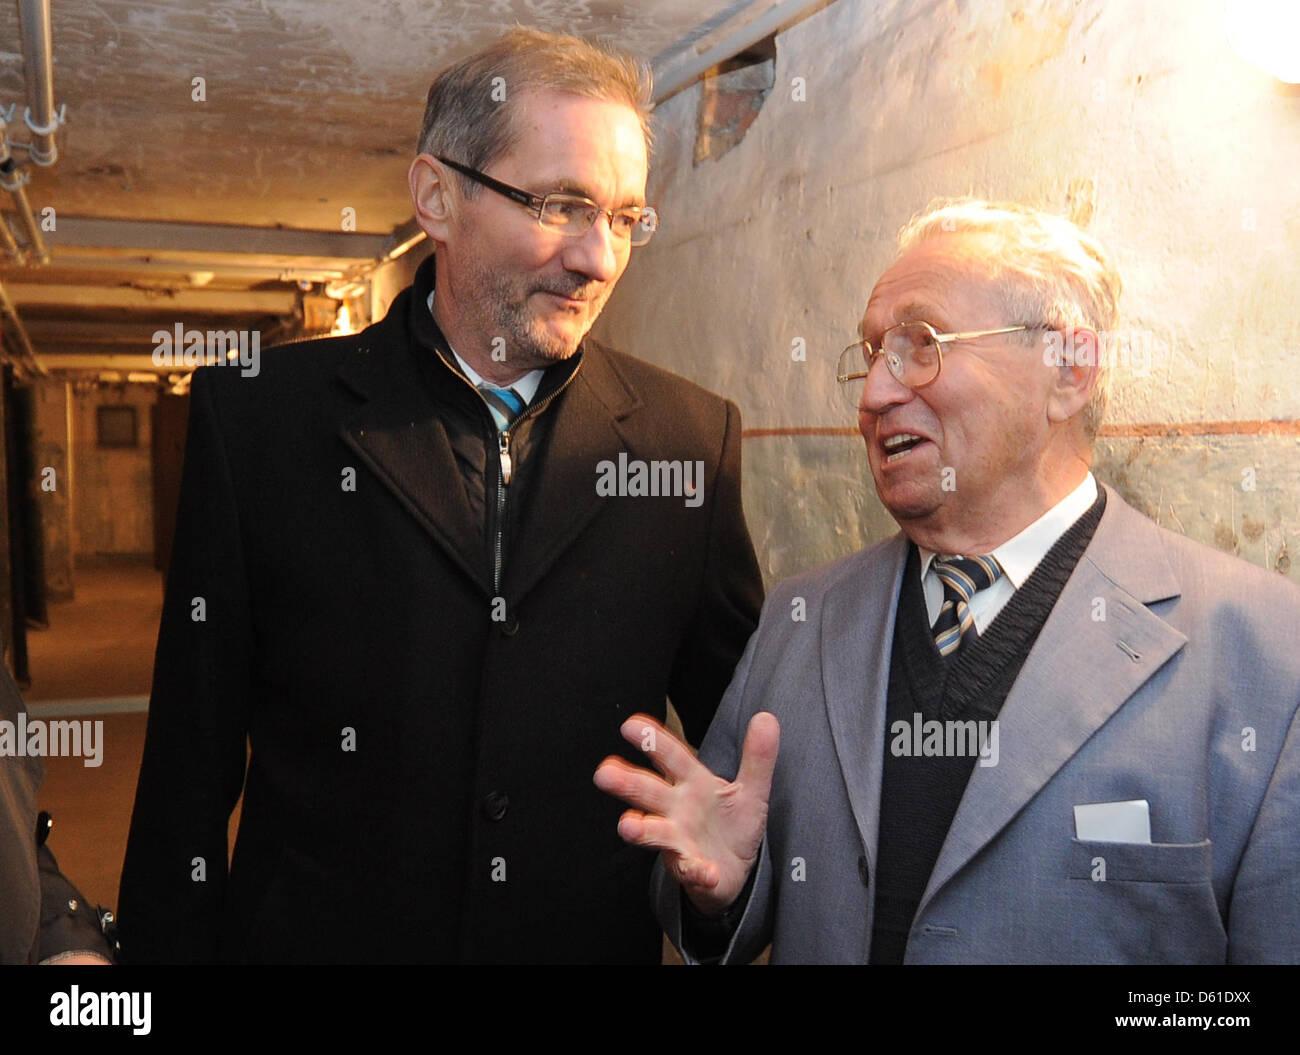 Premier of Brandenburg Matthias Platzeck (L) stands with former prisoner Peter Seele in the basement of the KGB - Stock Image